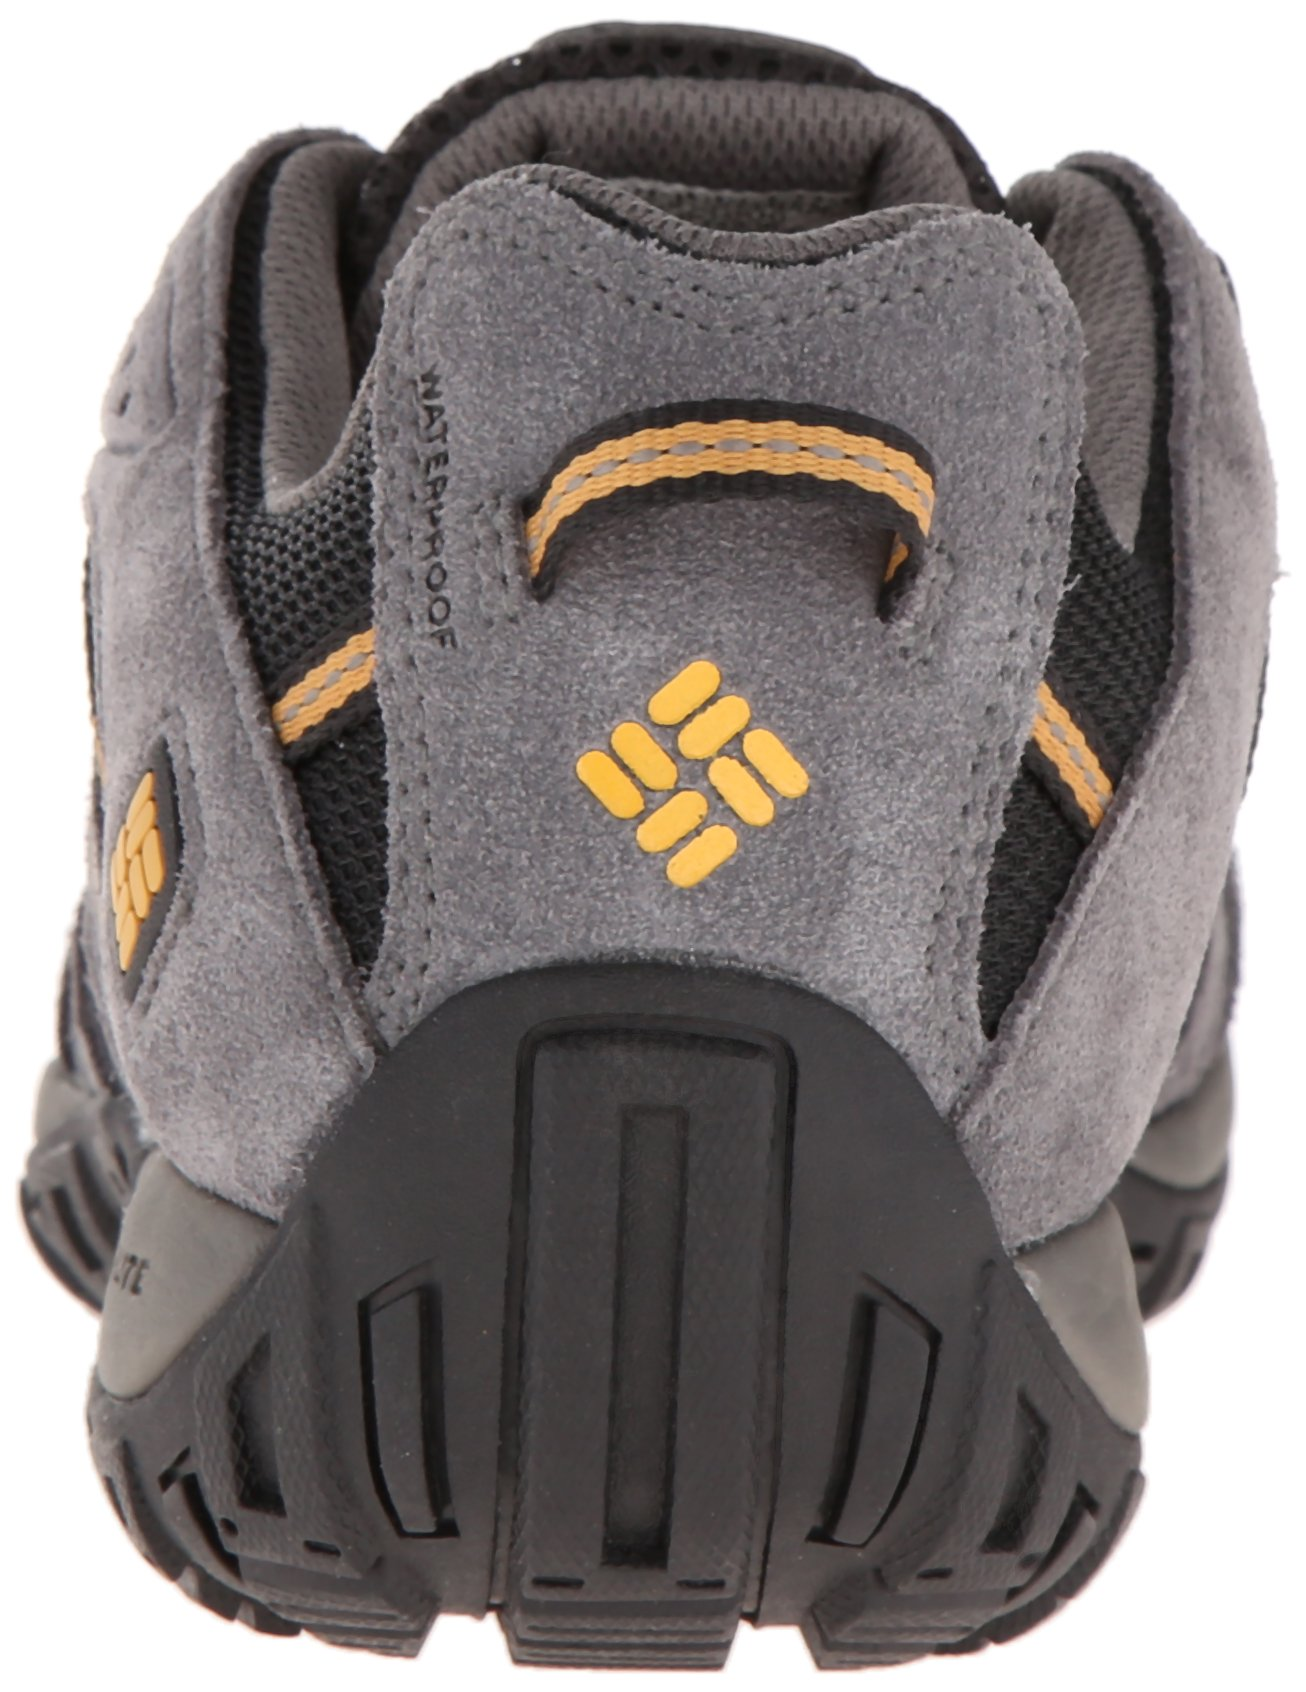 Columbia Men's Redmond Waterproof Hiking Shoe Black, Squash 7.5 D US by Columbia (Image #2)